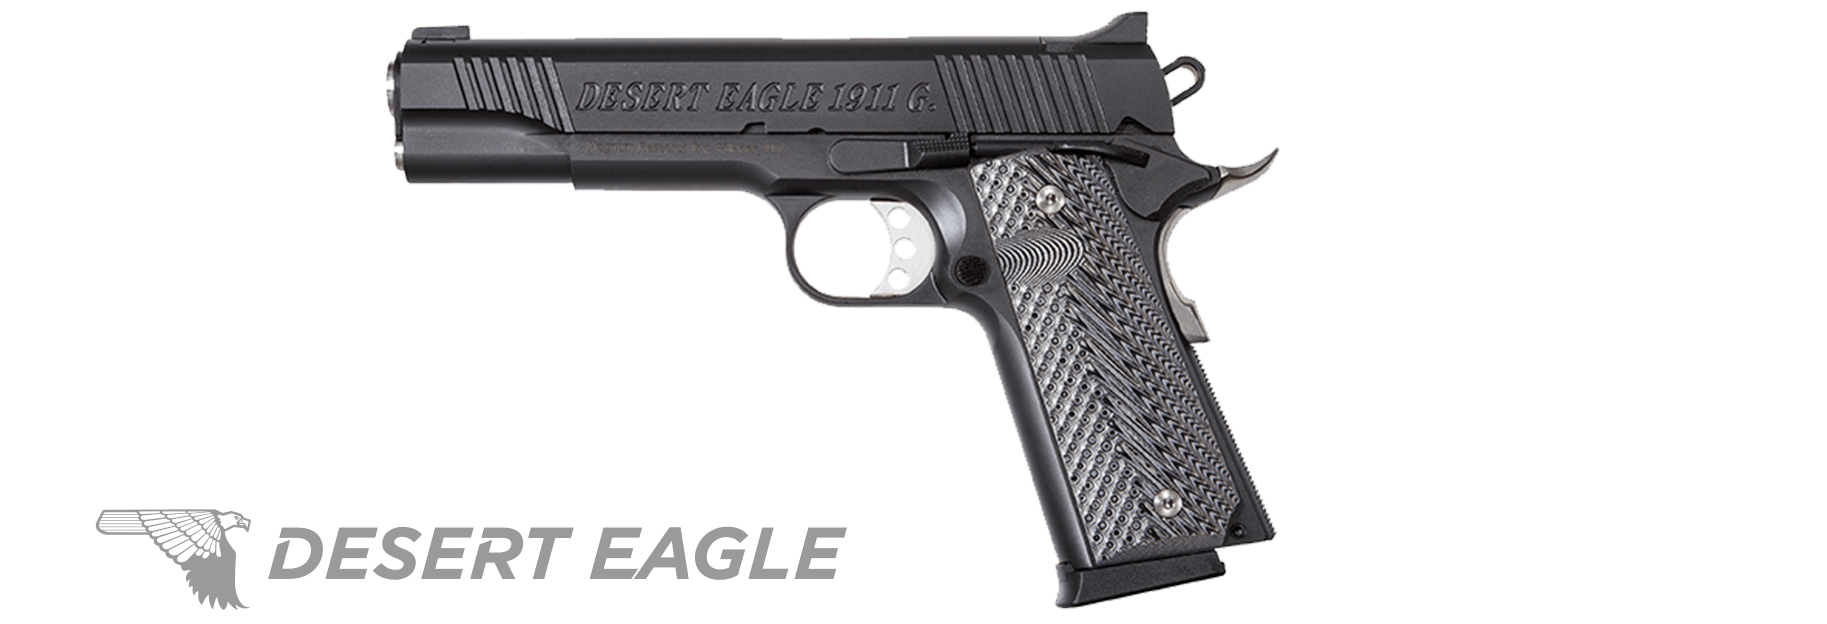 Desert Eagle 1911 - Magnum Research, Inc  | Desert Eagle